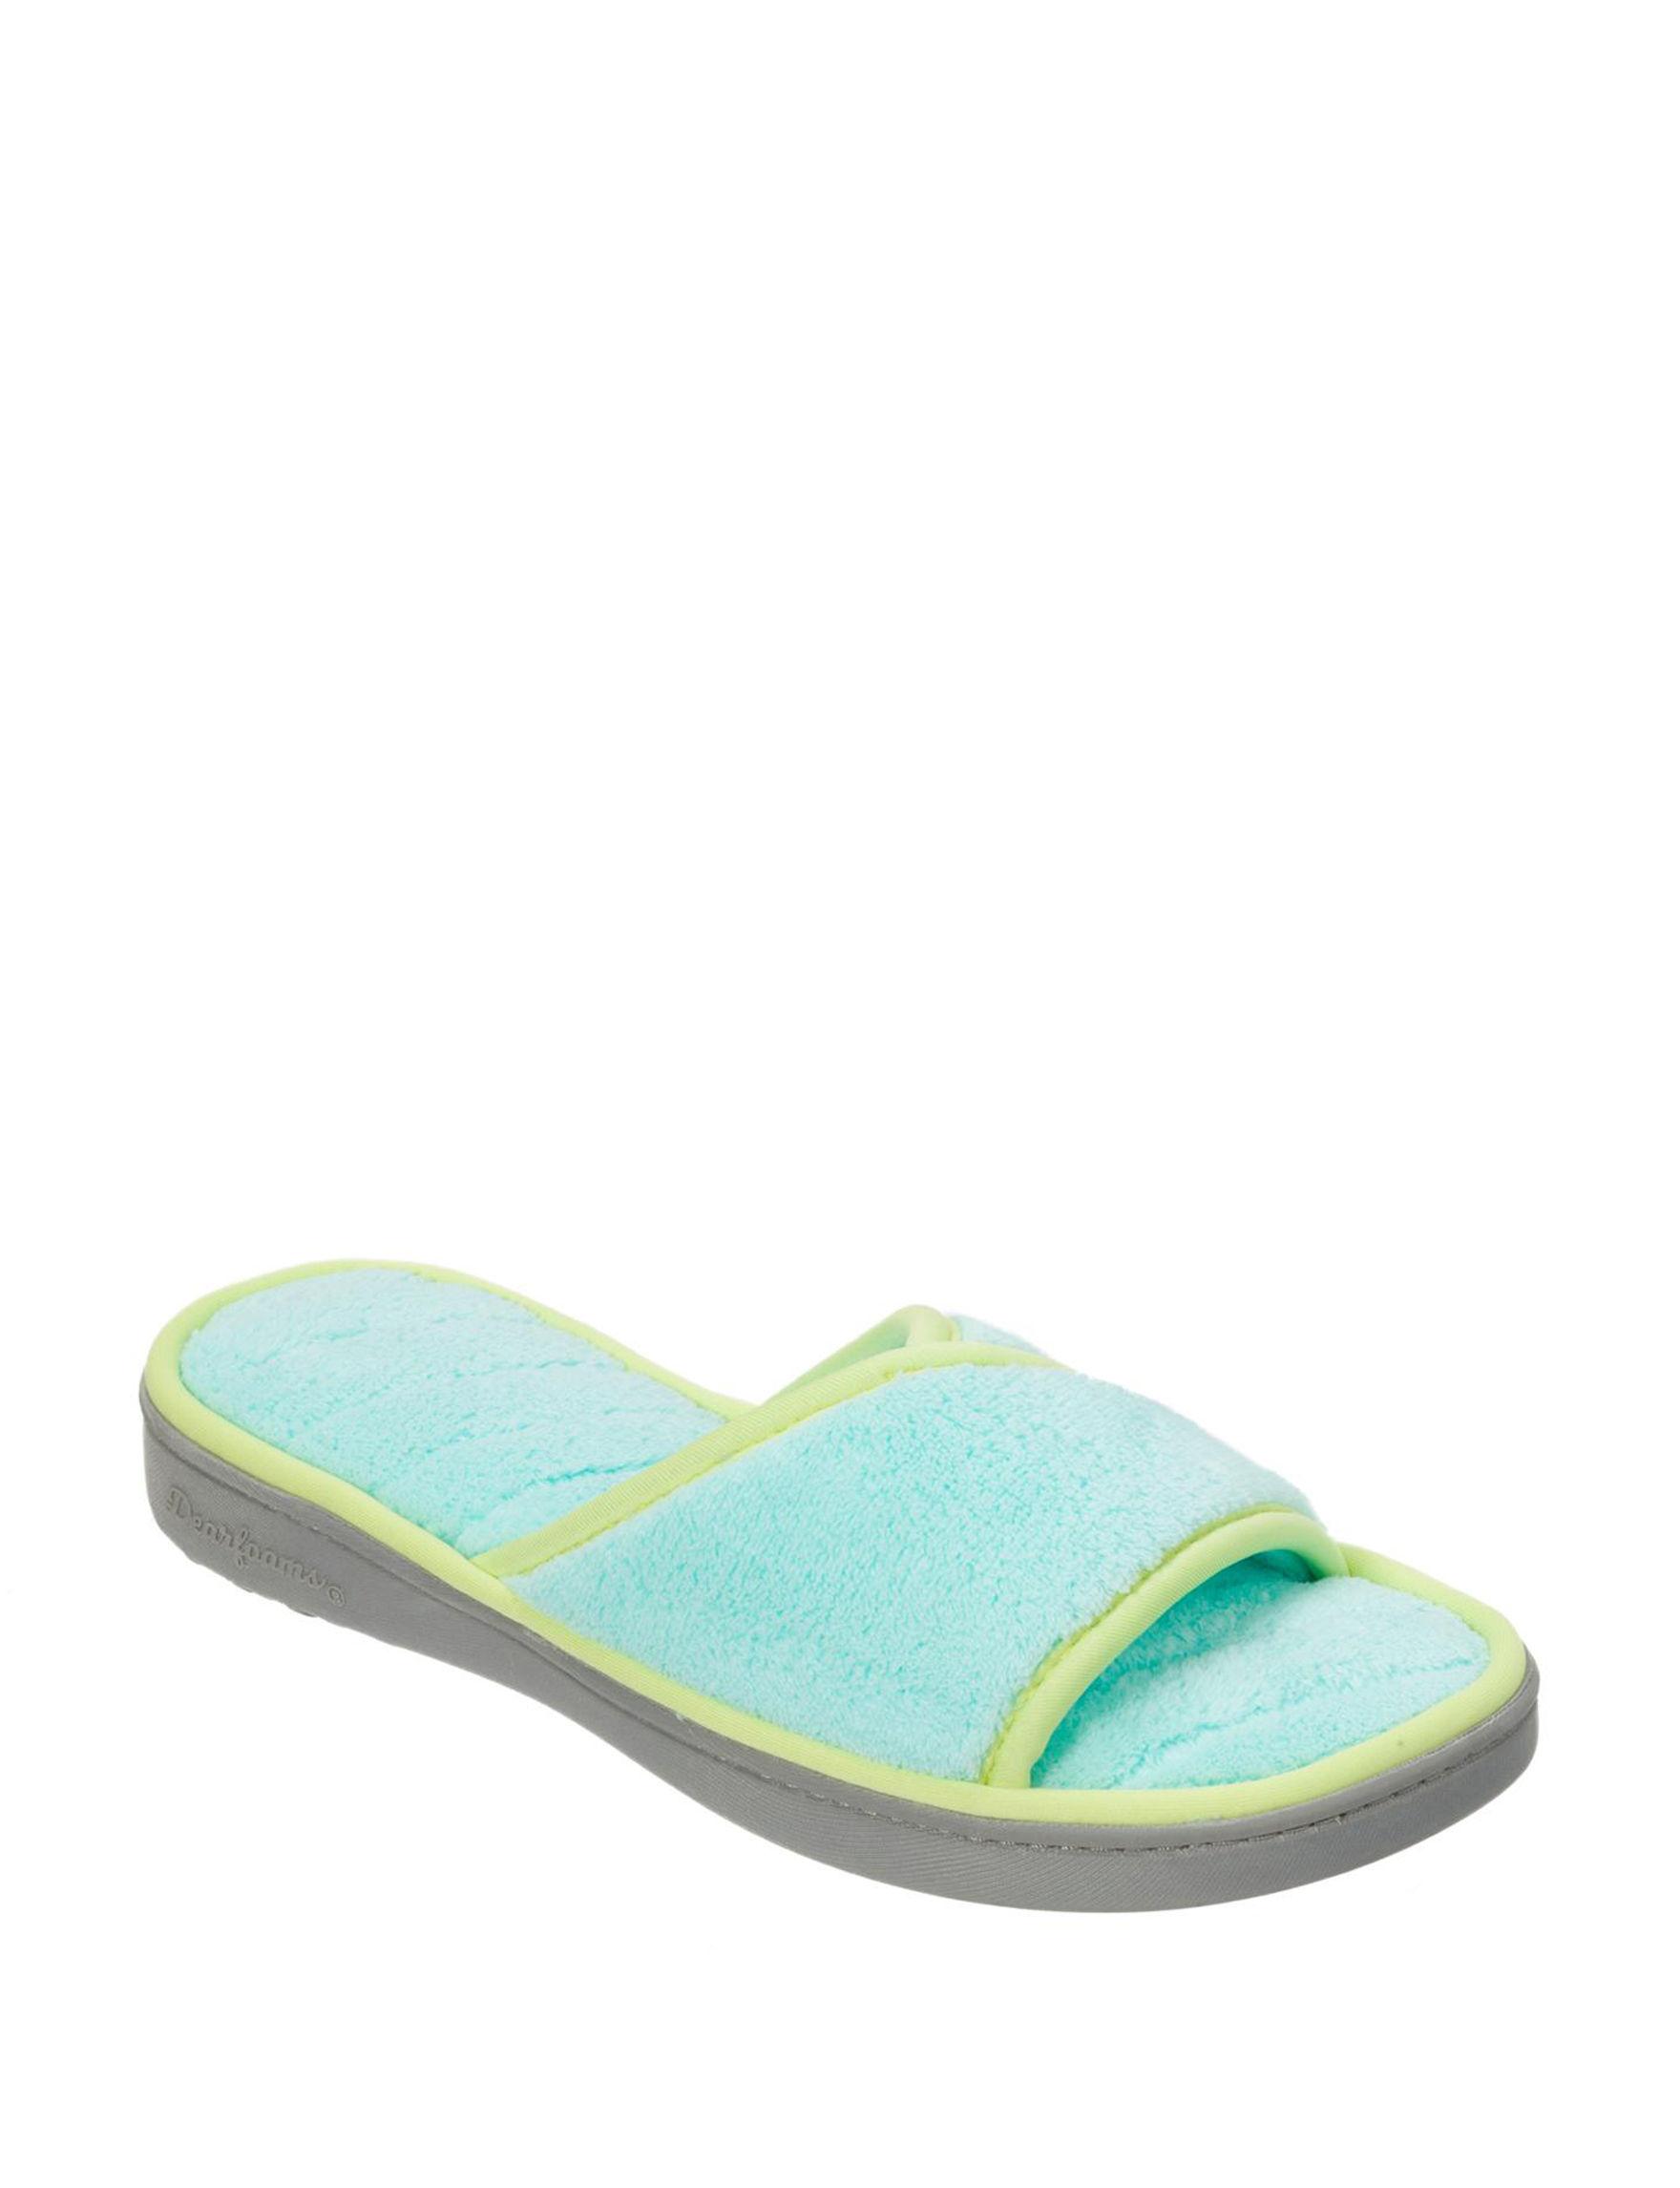 Dearfoam Blue Slipper Sandals